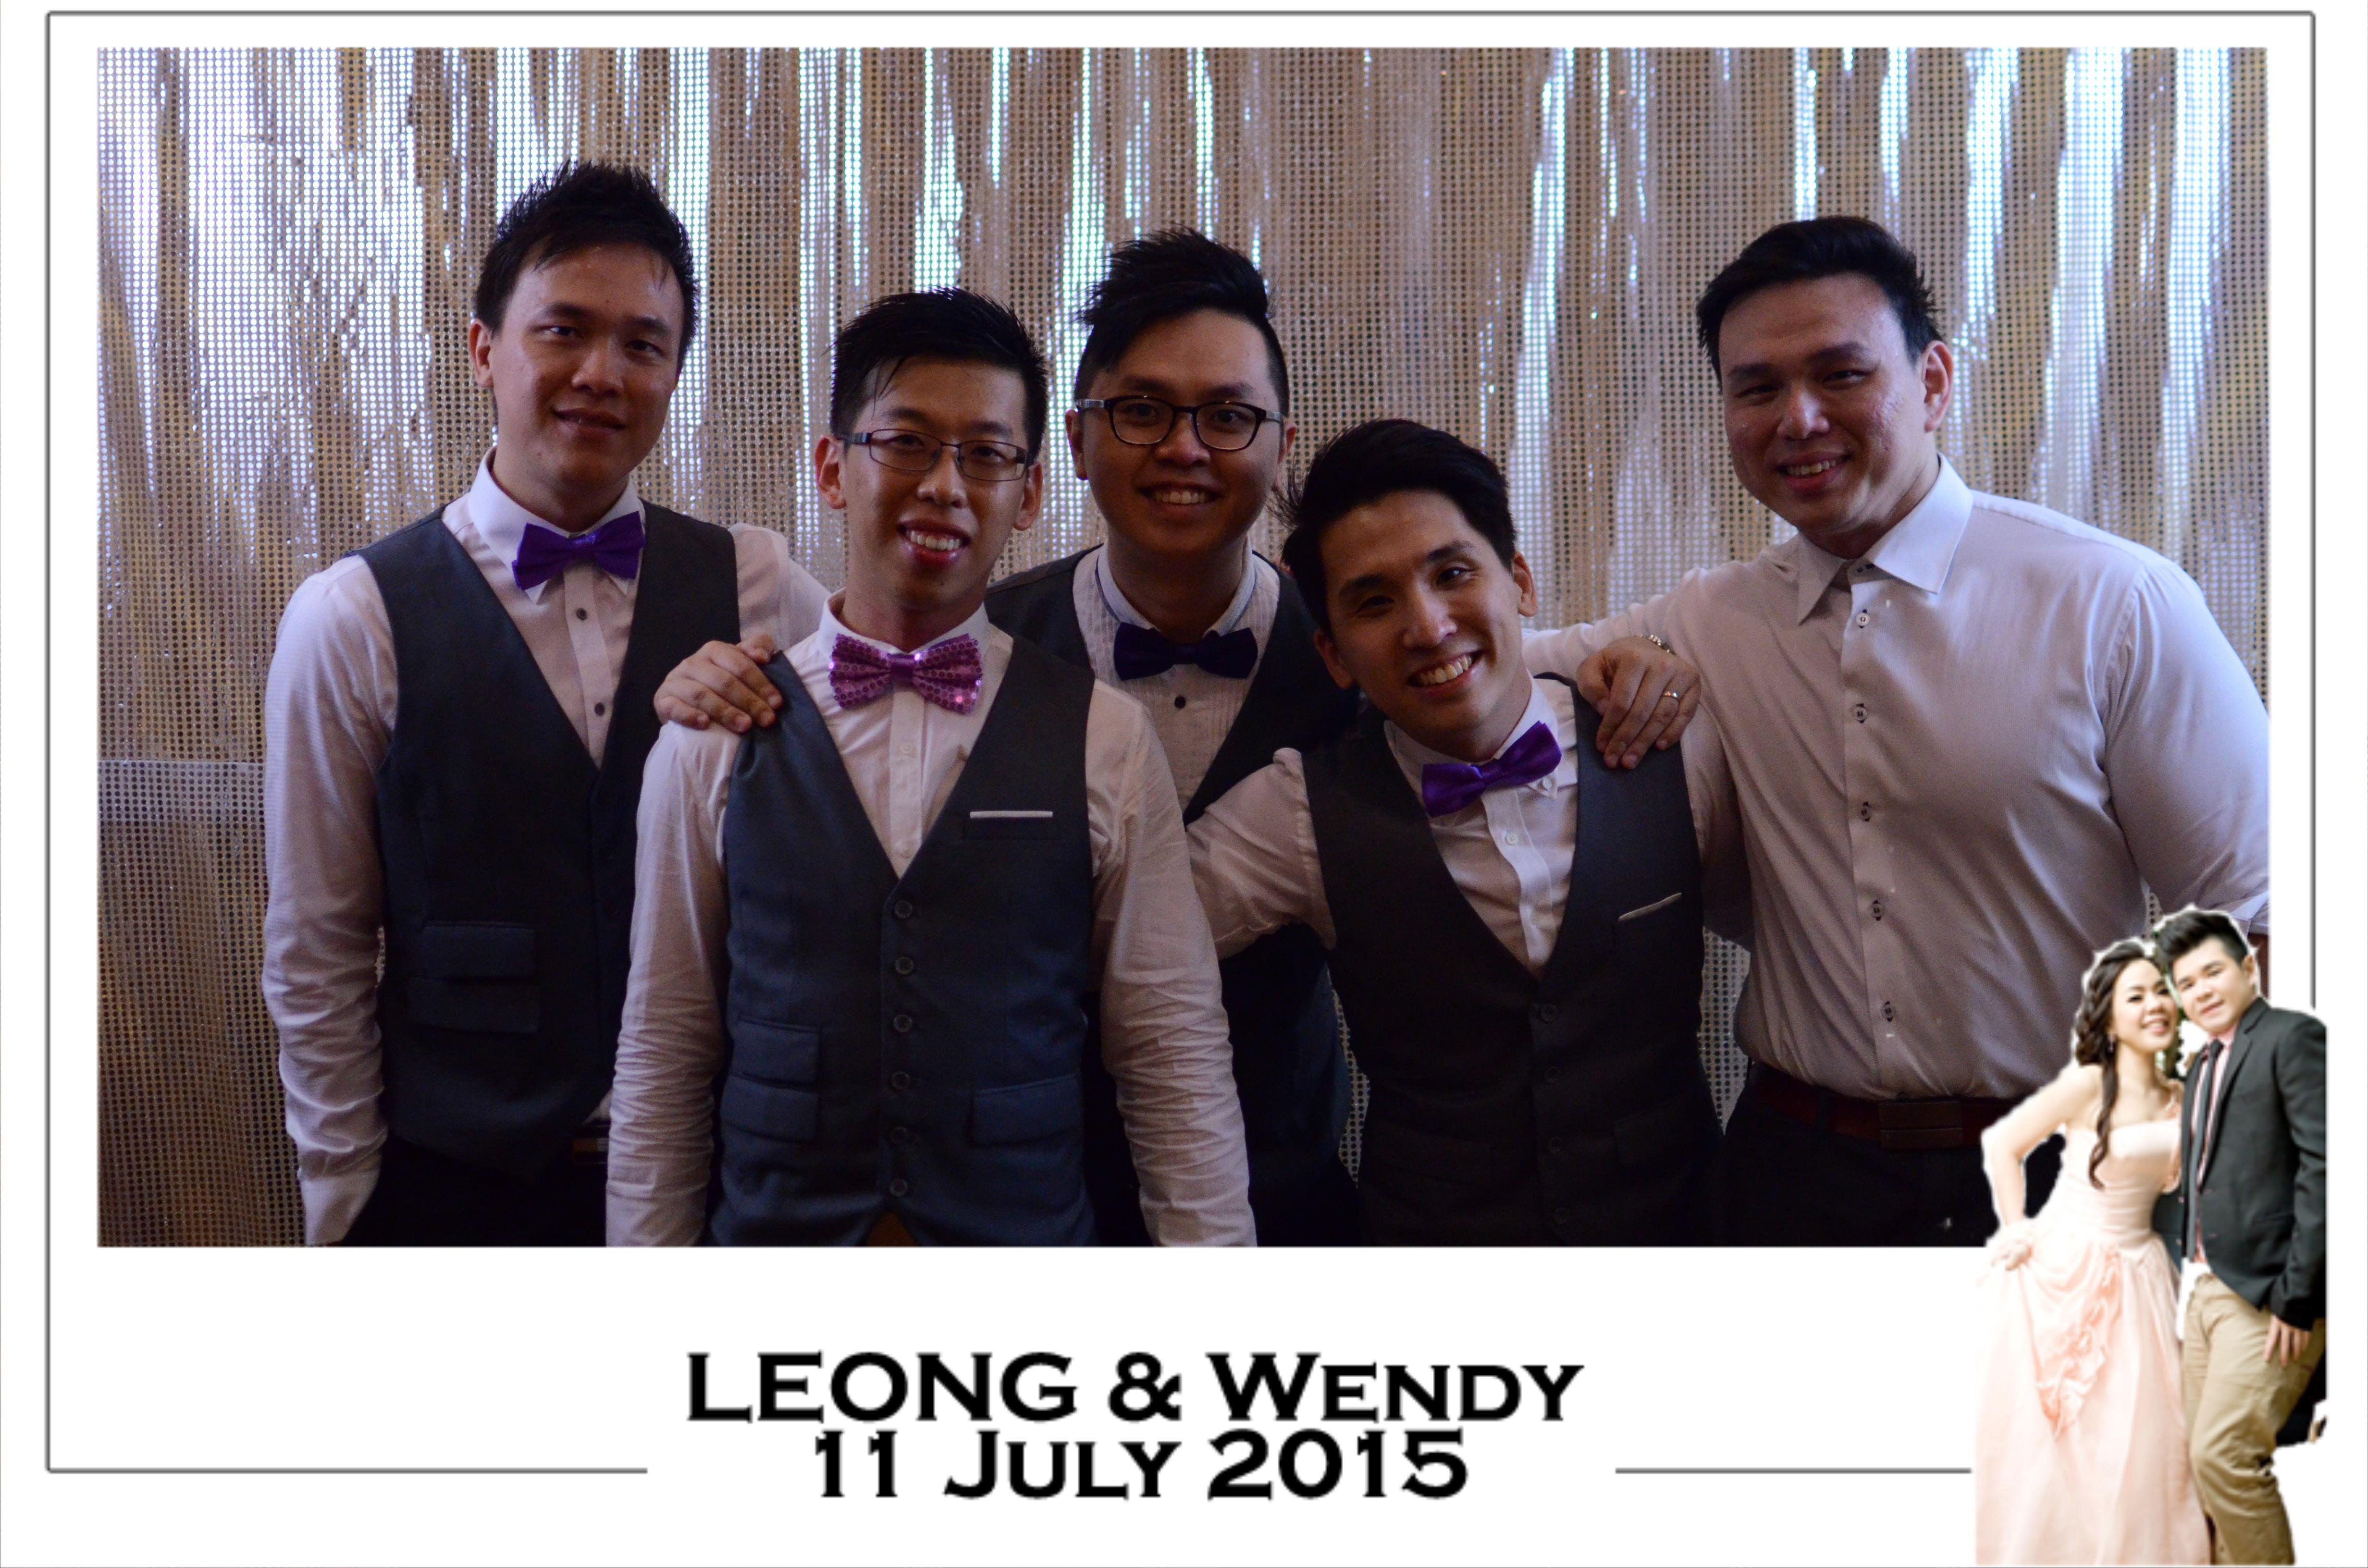 Leong & Wendy-8.jpg